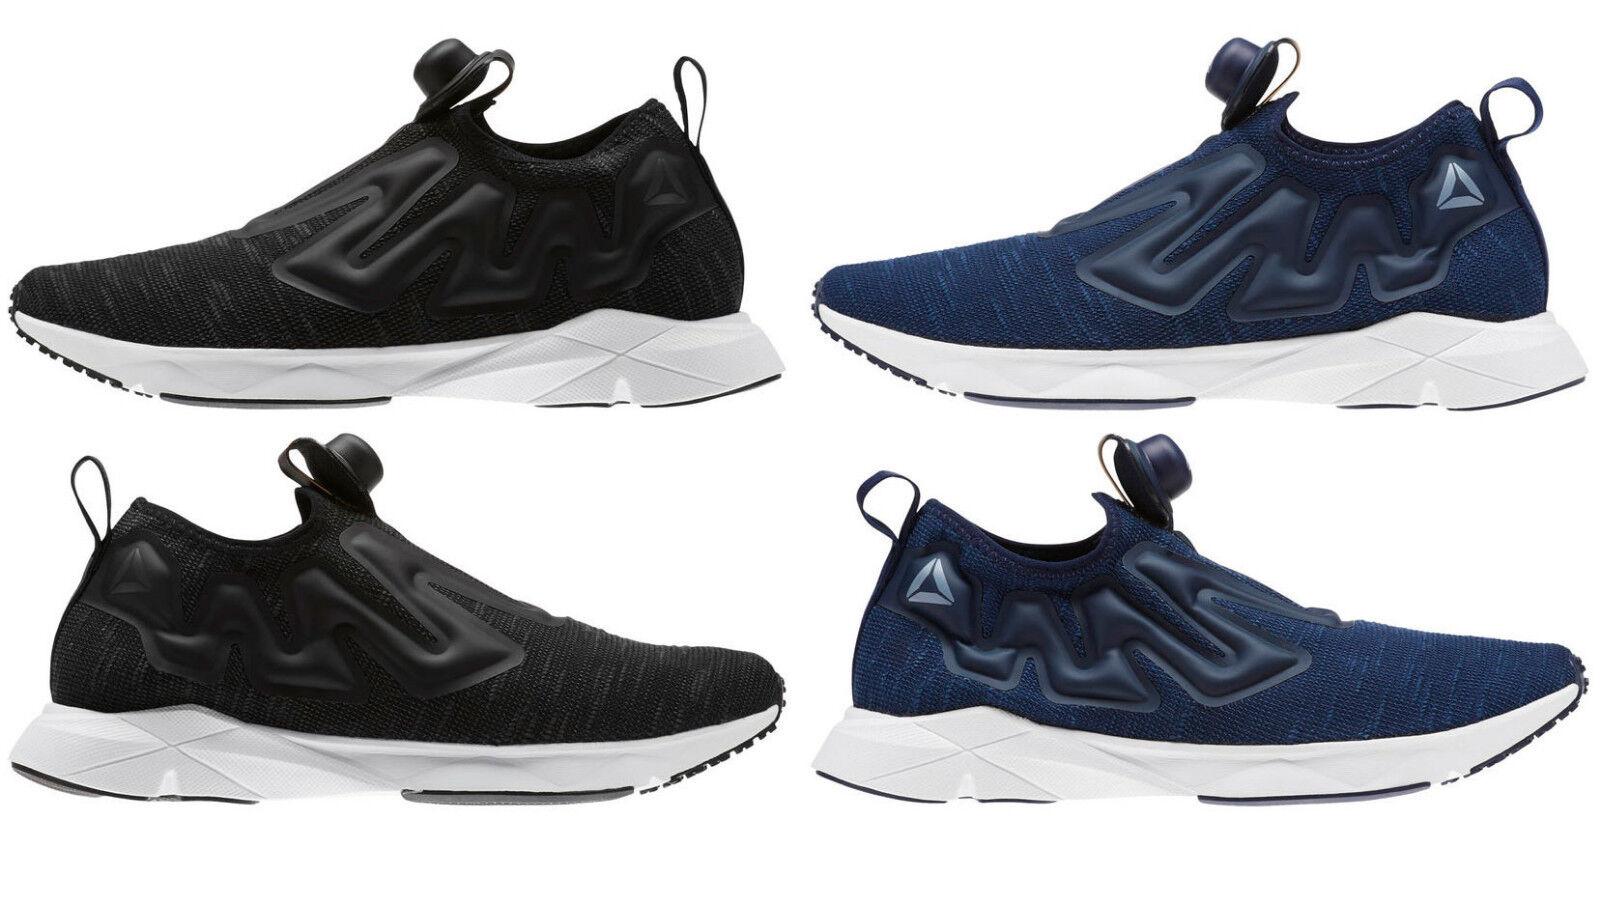 Reebok Pump Supreme Distressed Men Running Shoes CN1196, CN1205 NEW w/box